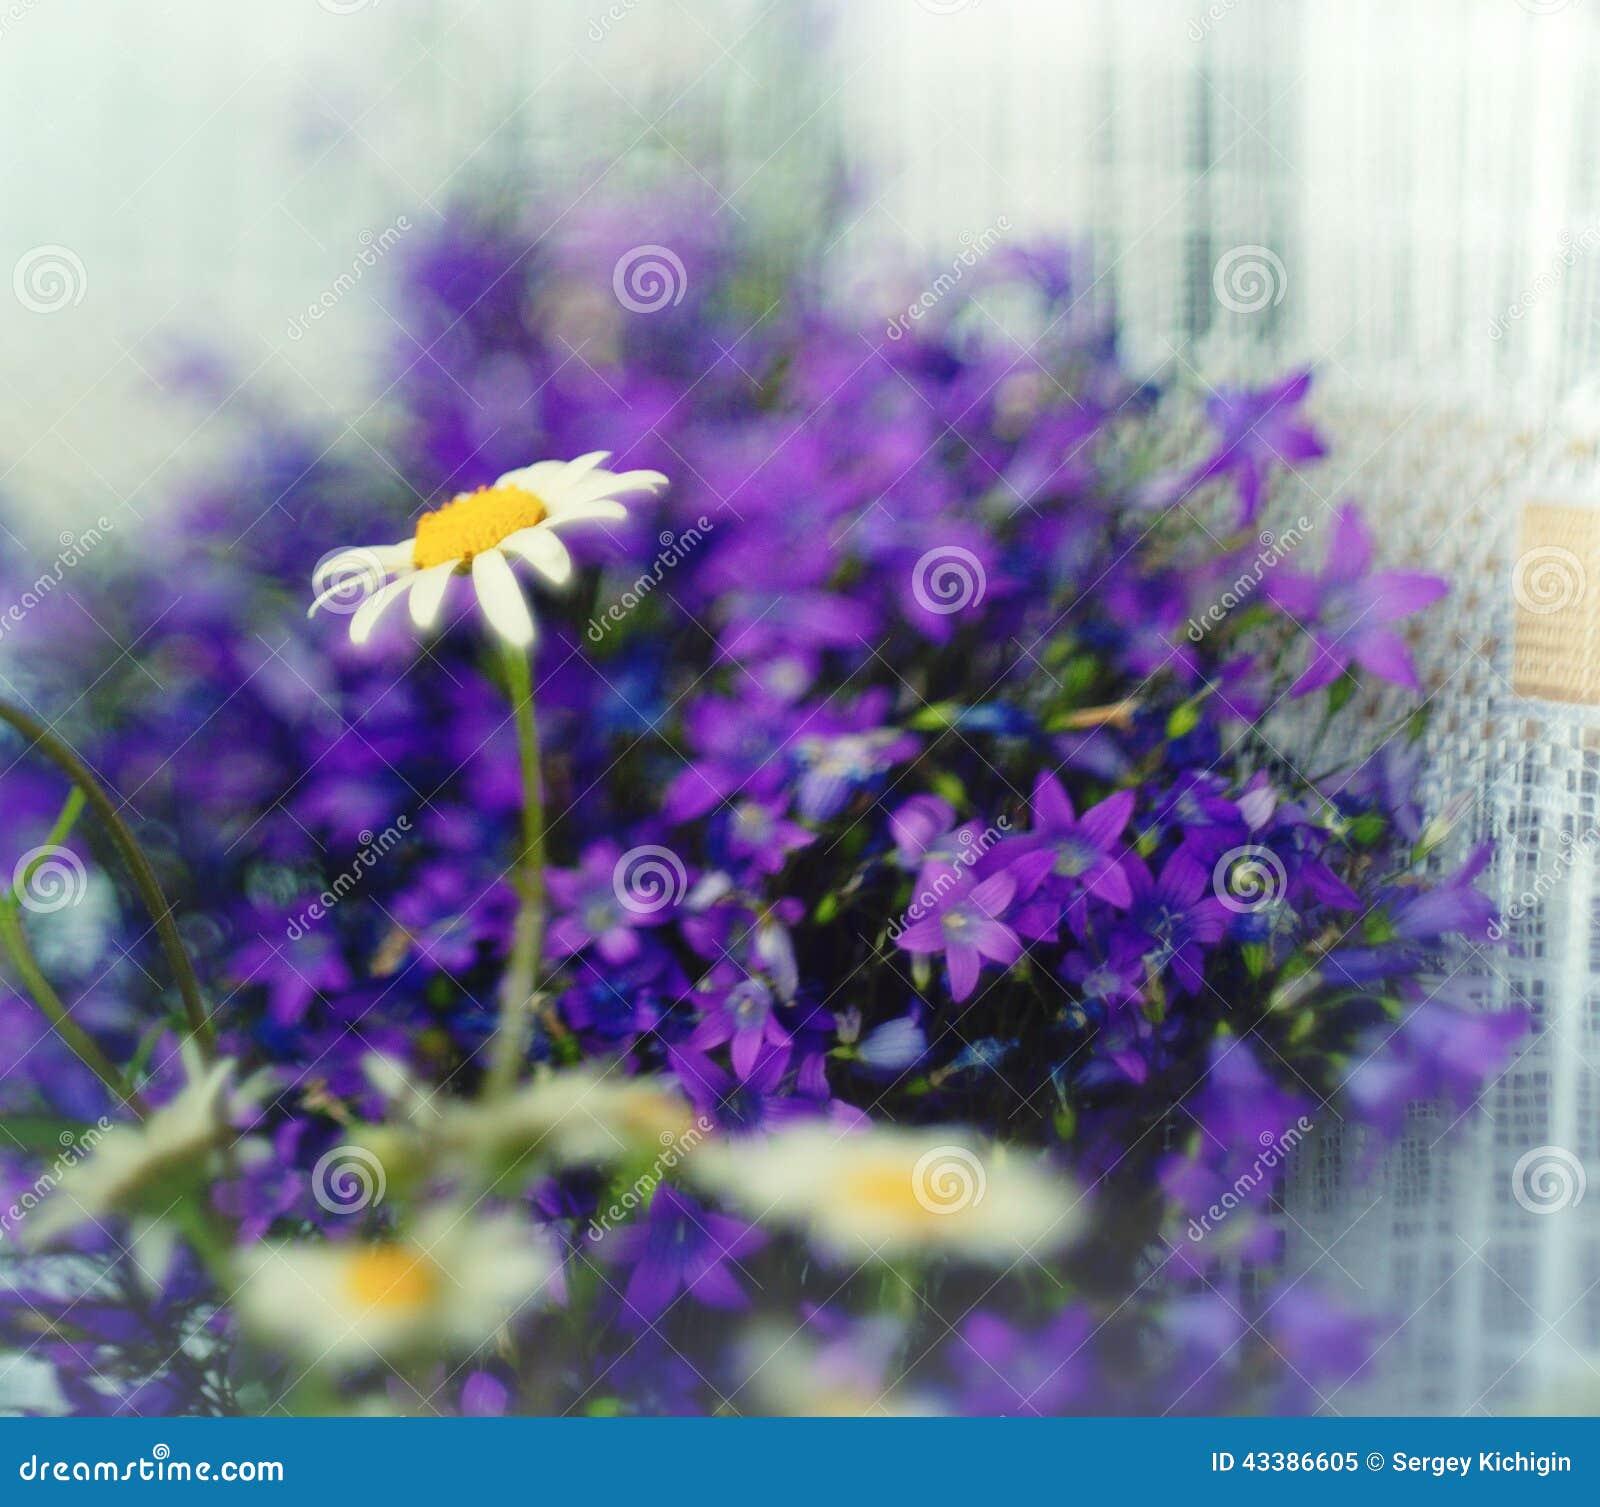 Small Purple Spring Wild Flowers Stock Image Image Of Fresh Blue